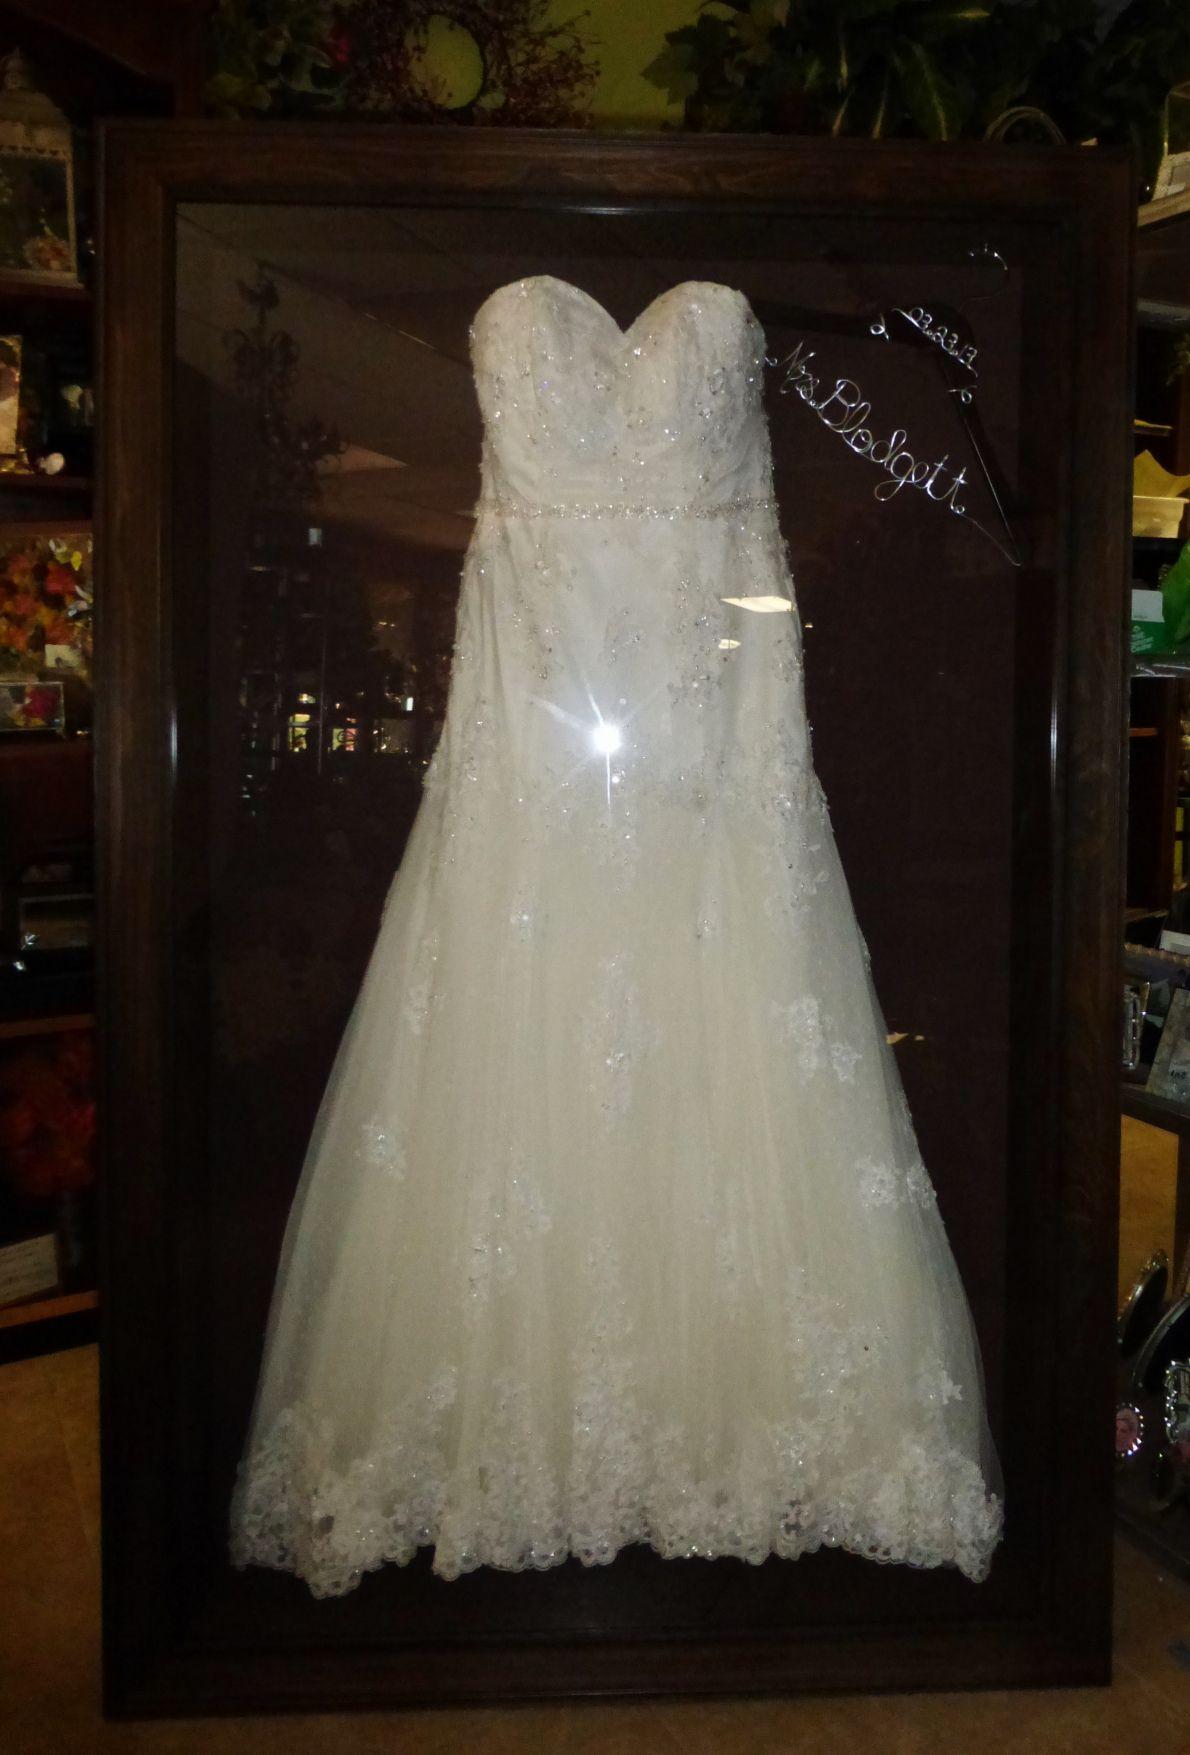 2018 Adrienne Maloof Wedding Dress - Best Shapewear for Wedding Dre ...